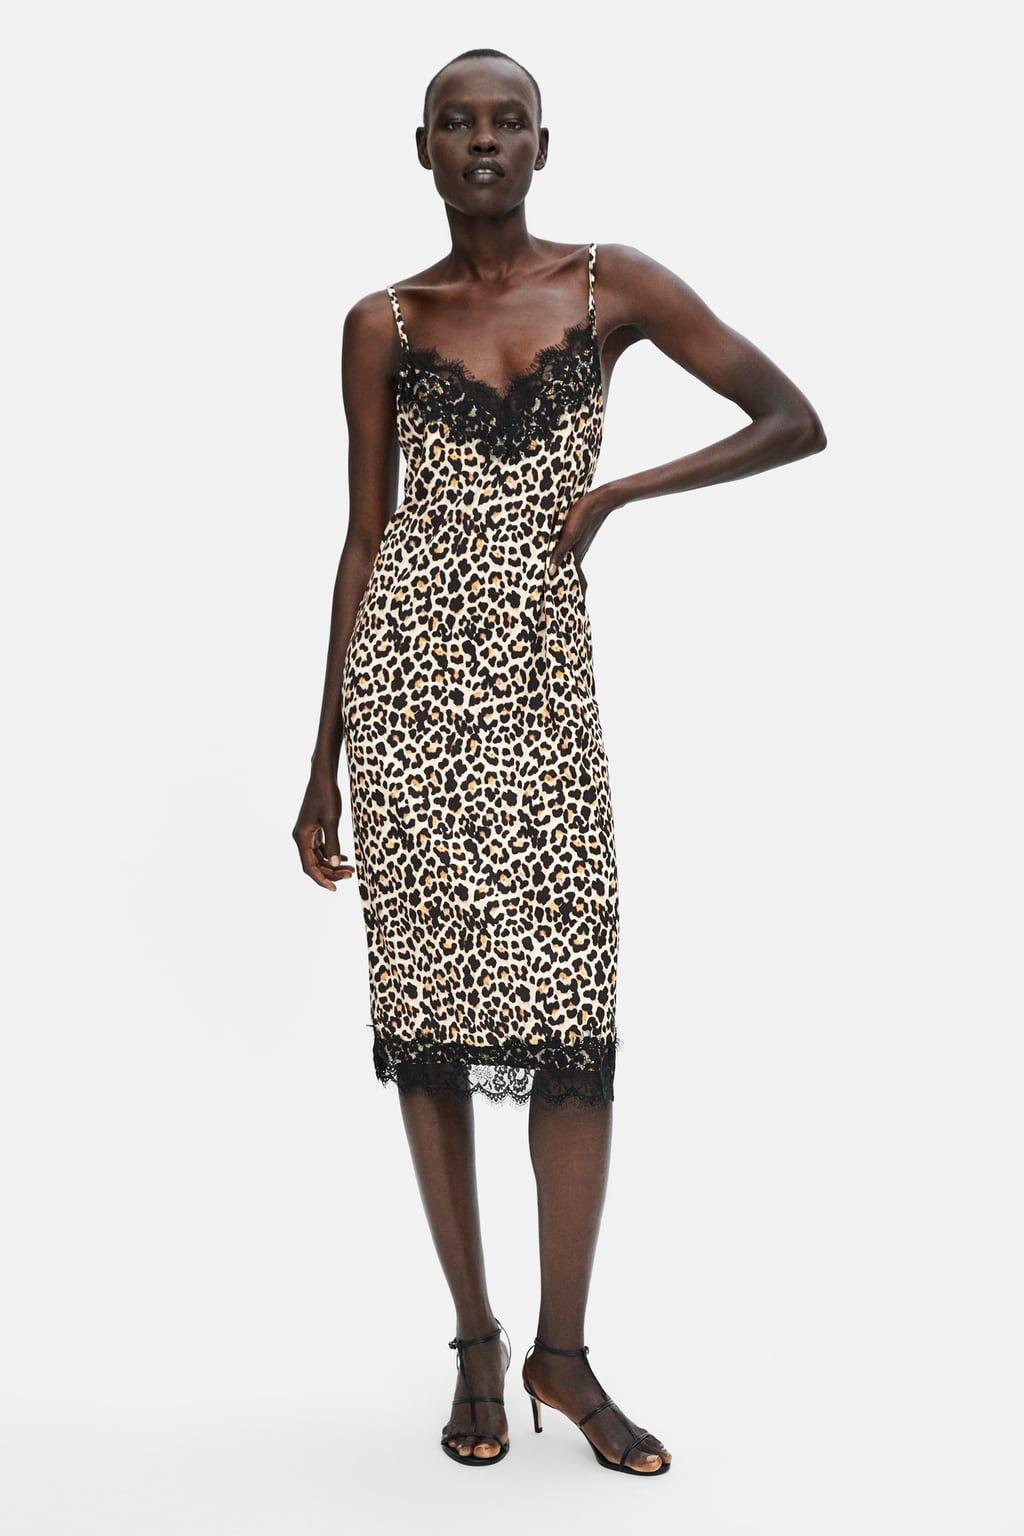 032e9183 VESTIDO LENCERO | ReRe | Dresses, Fashion dresses, Animal print outfits